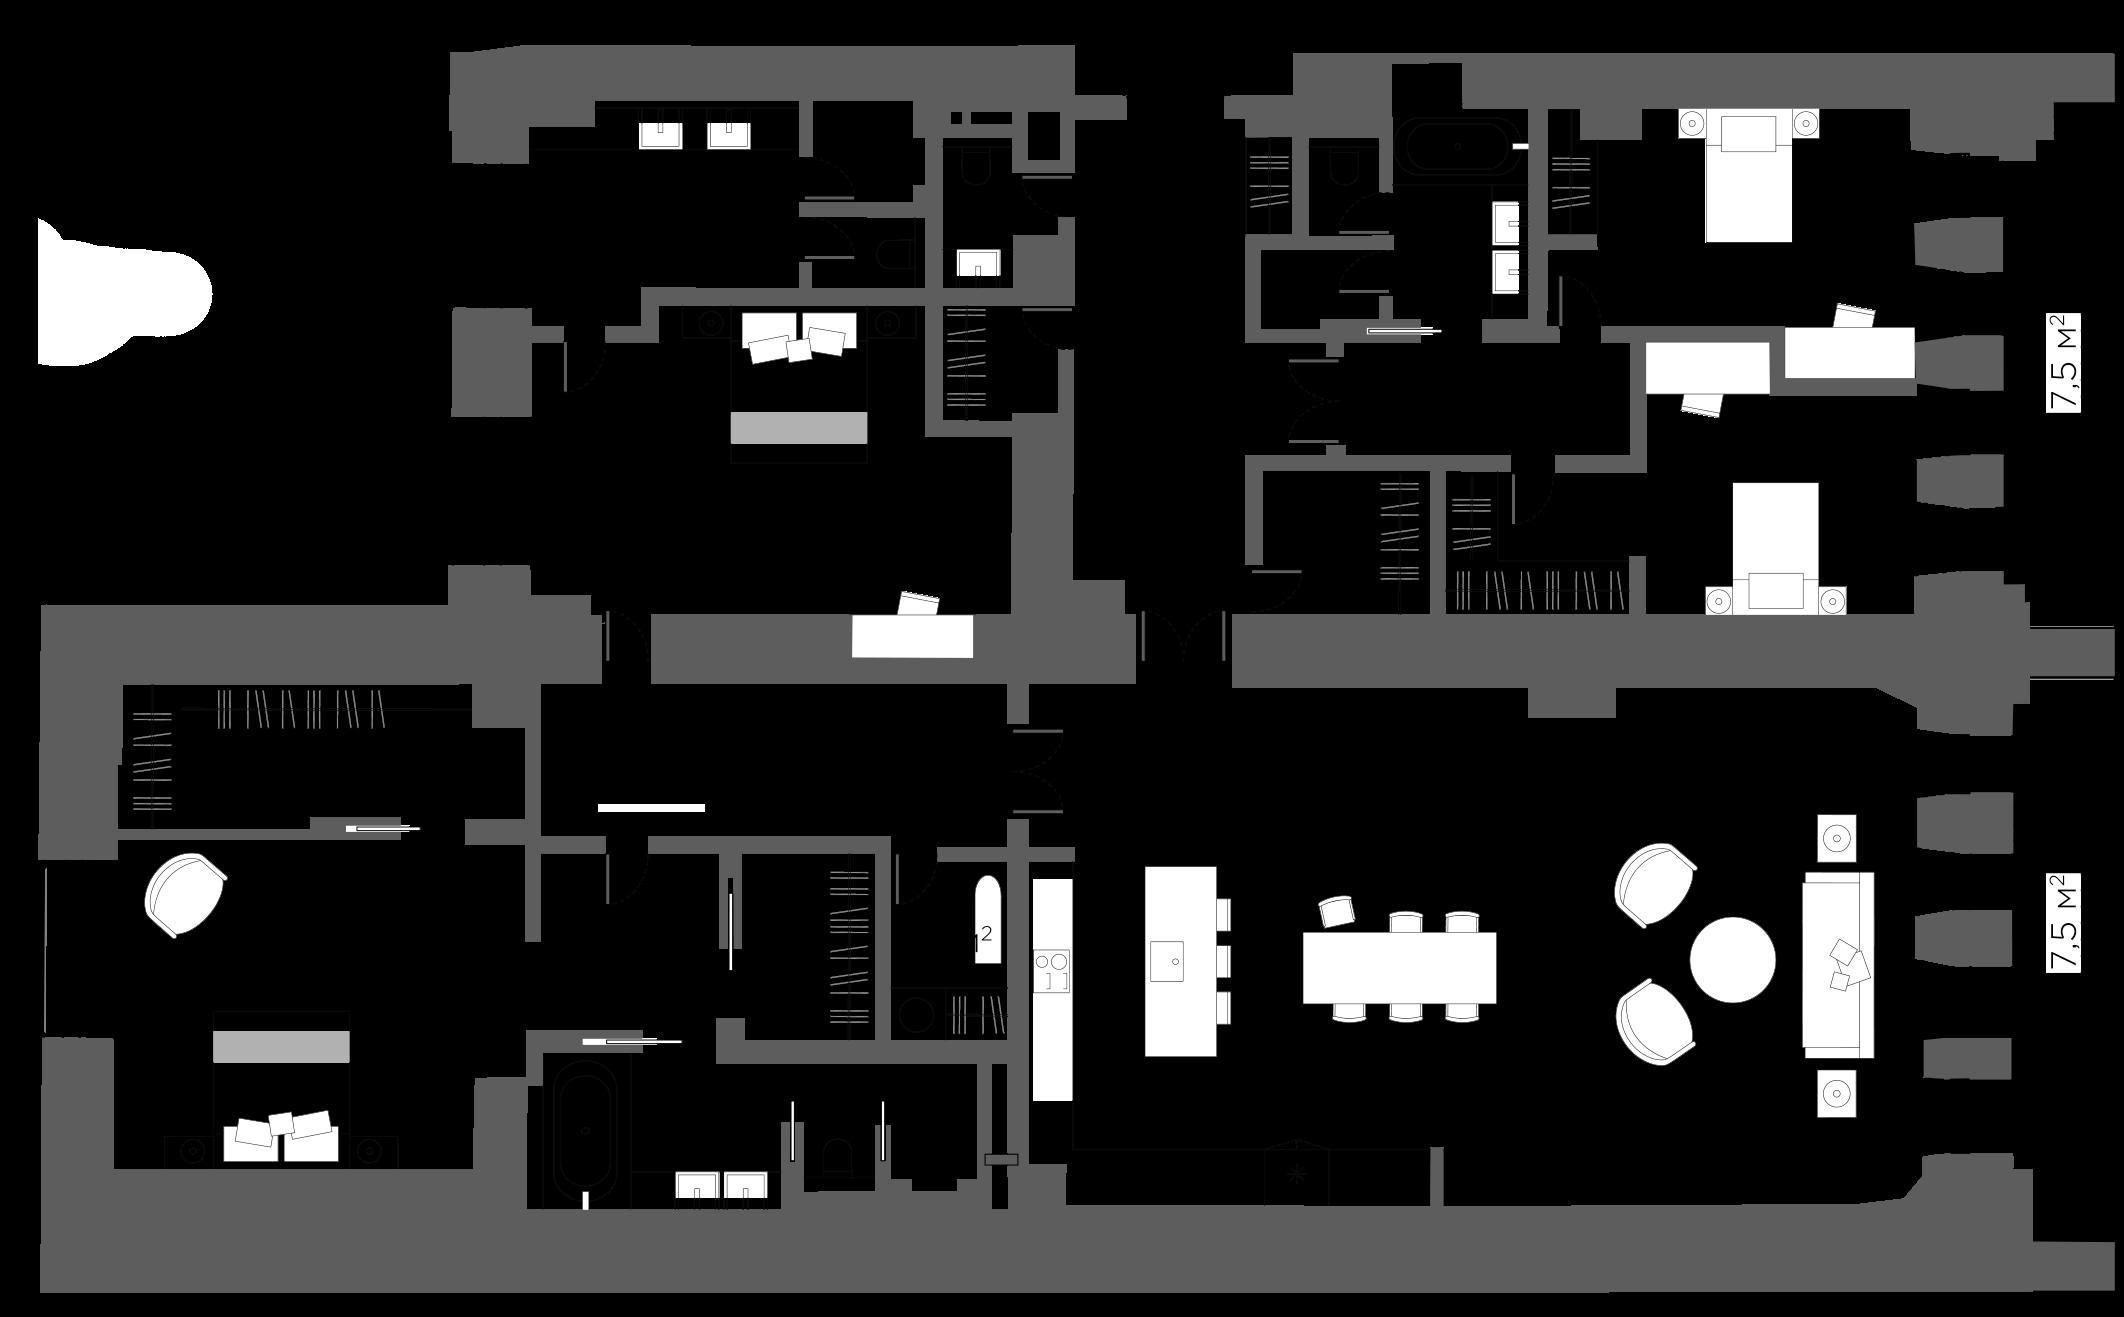 5Е-к.кв, 233.22 м²